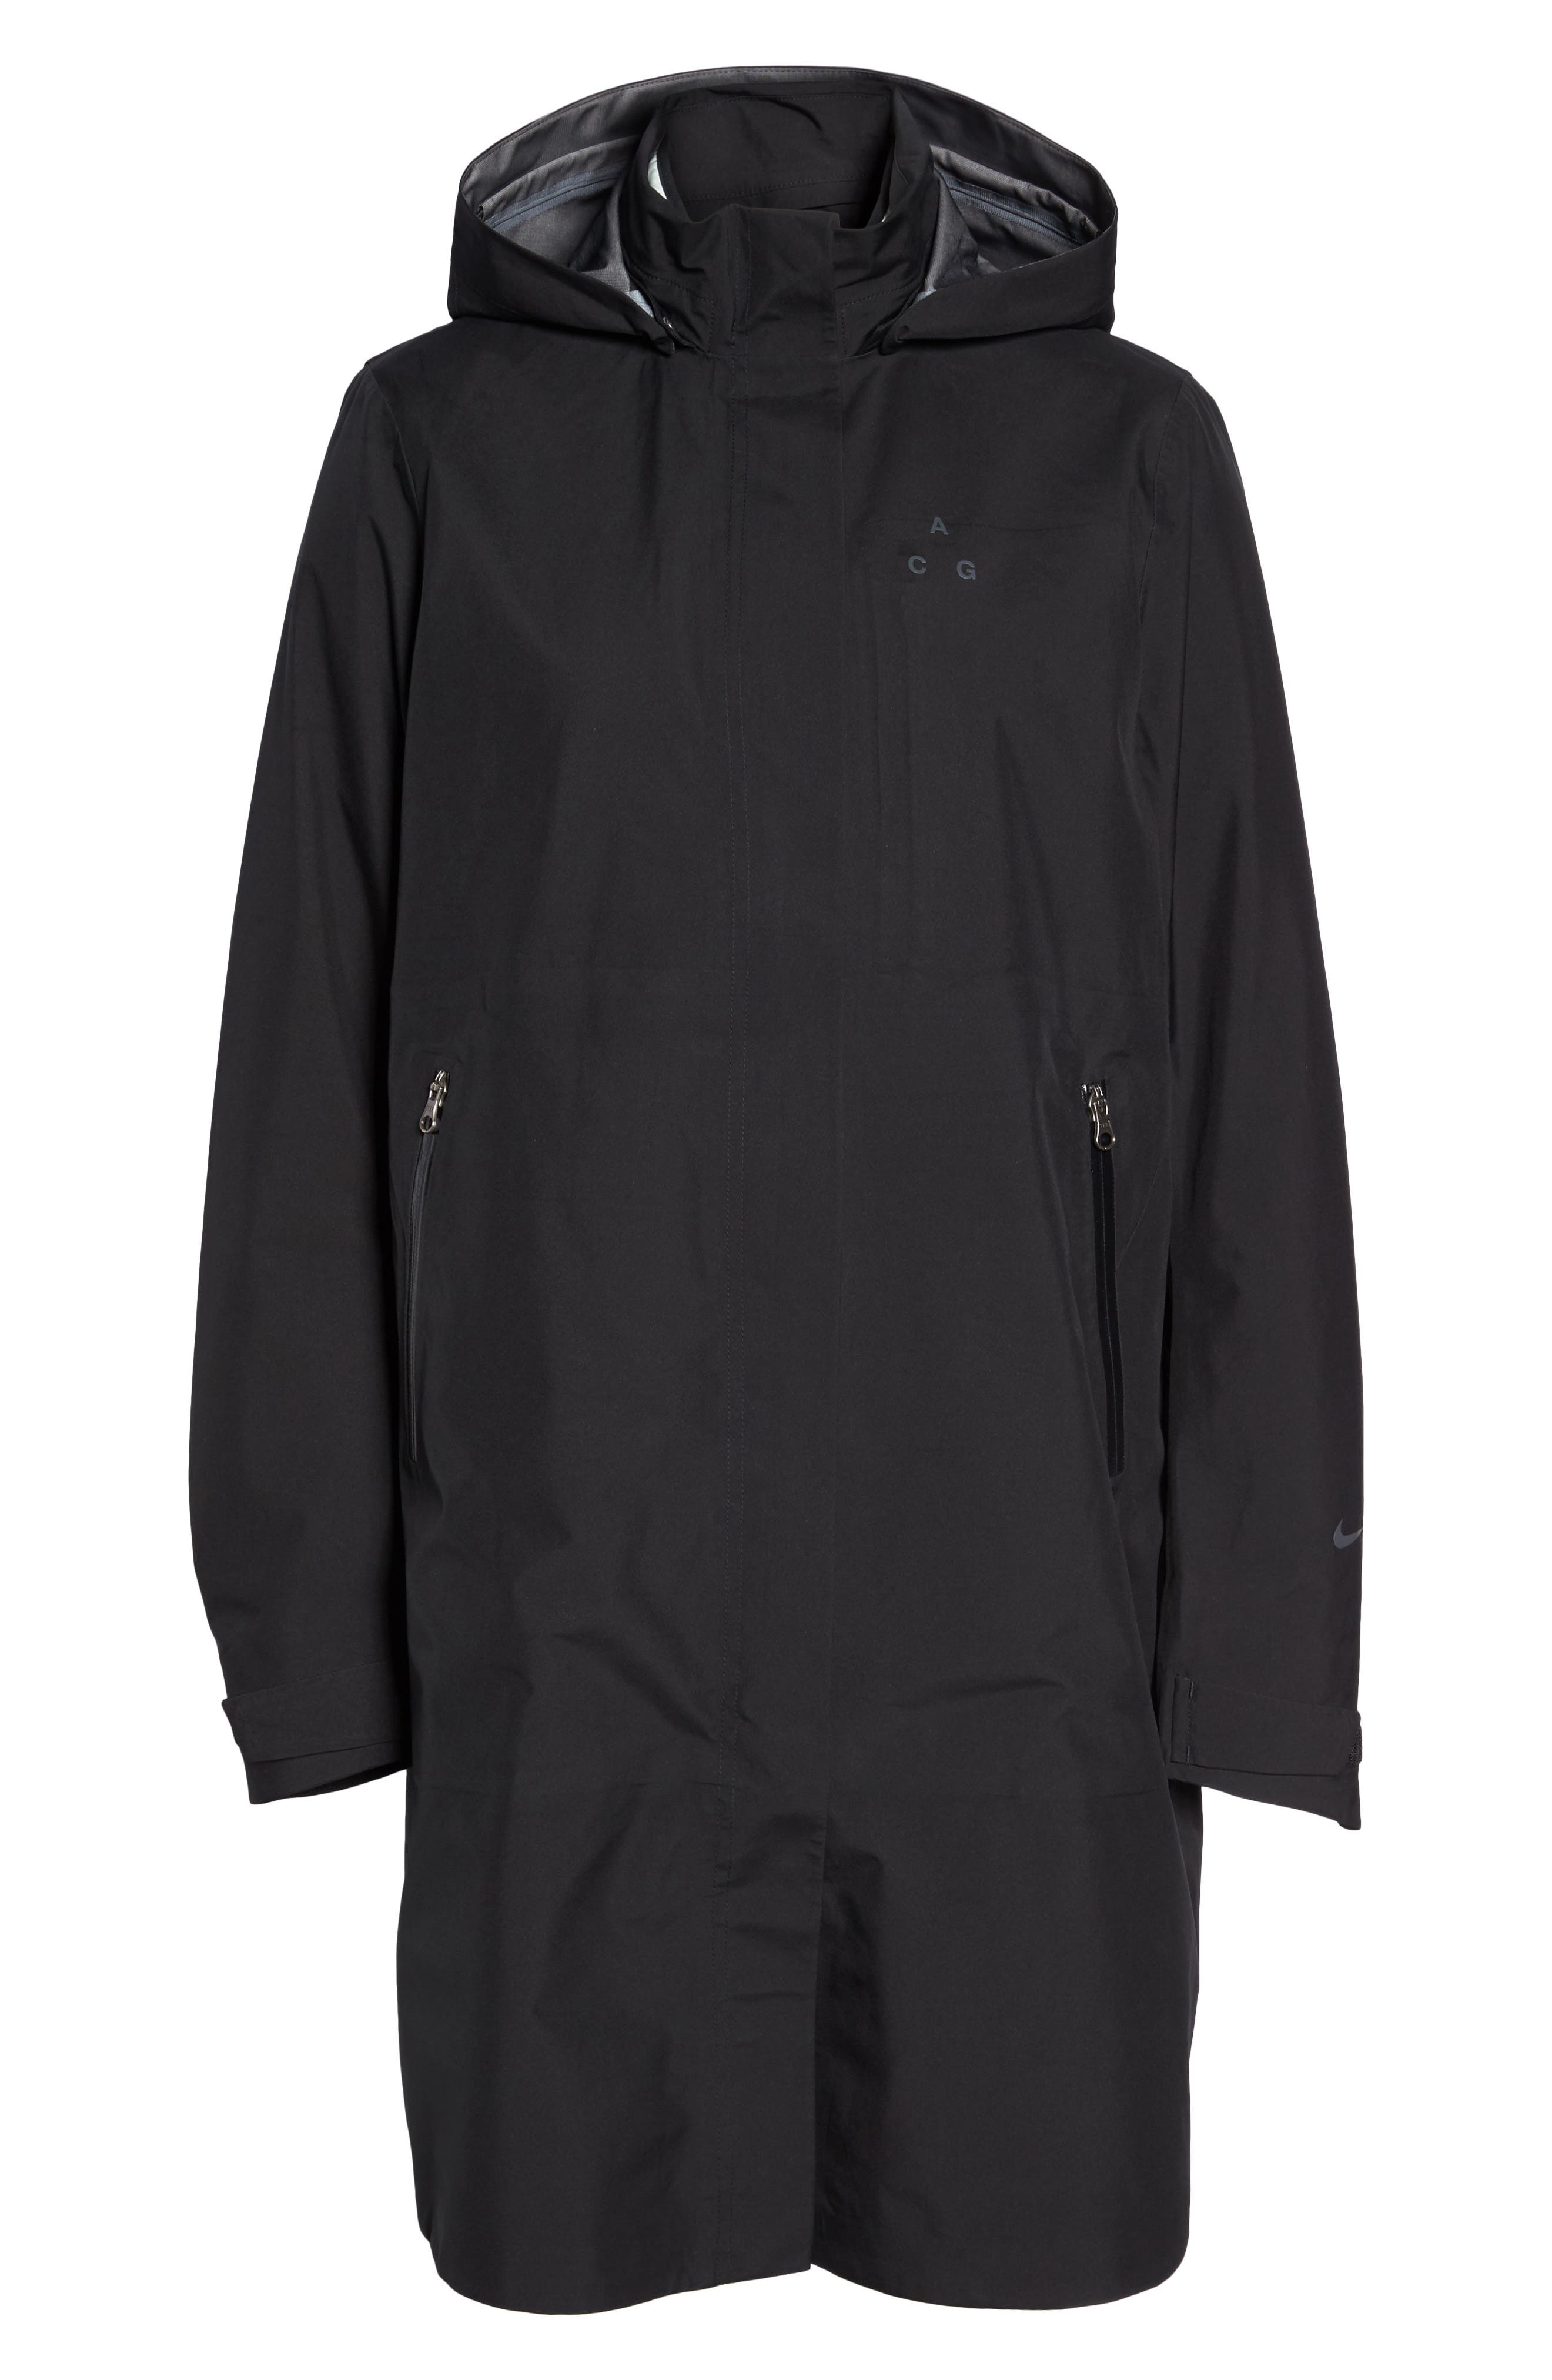 NikeLab ACG 3-in-1 System Women's Coat,                             Alternate thumbnail 8, color,